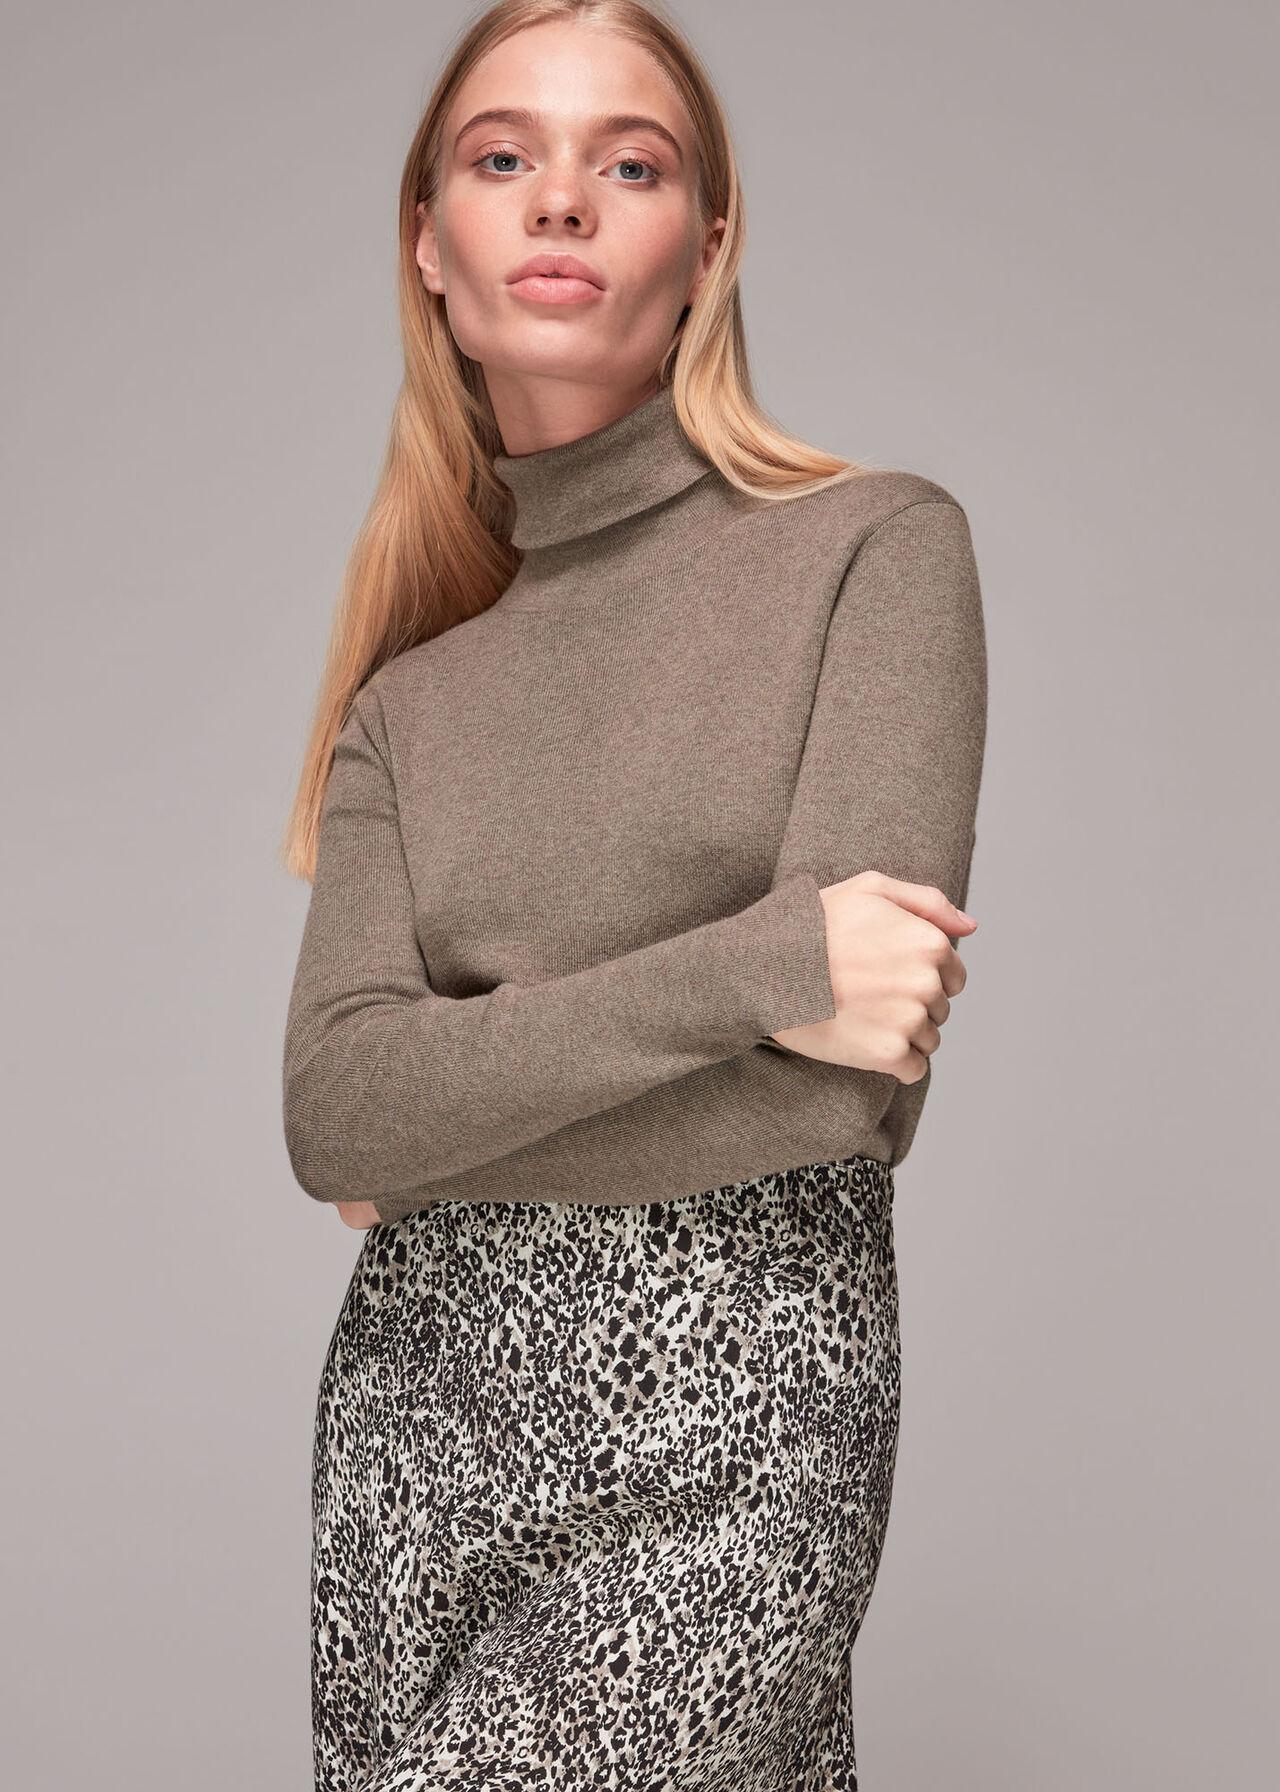 Micro Animal Bias Cut Skirt